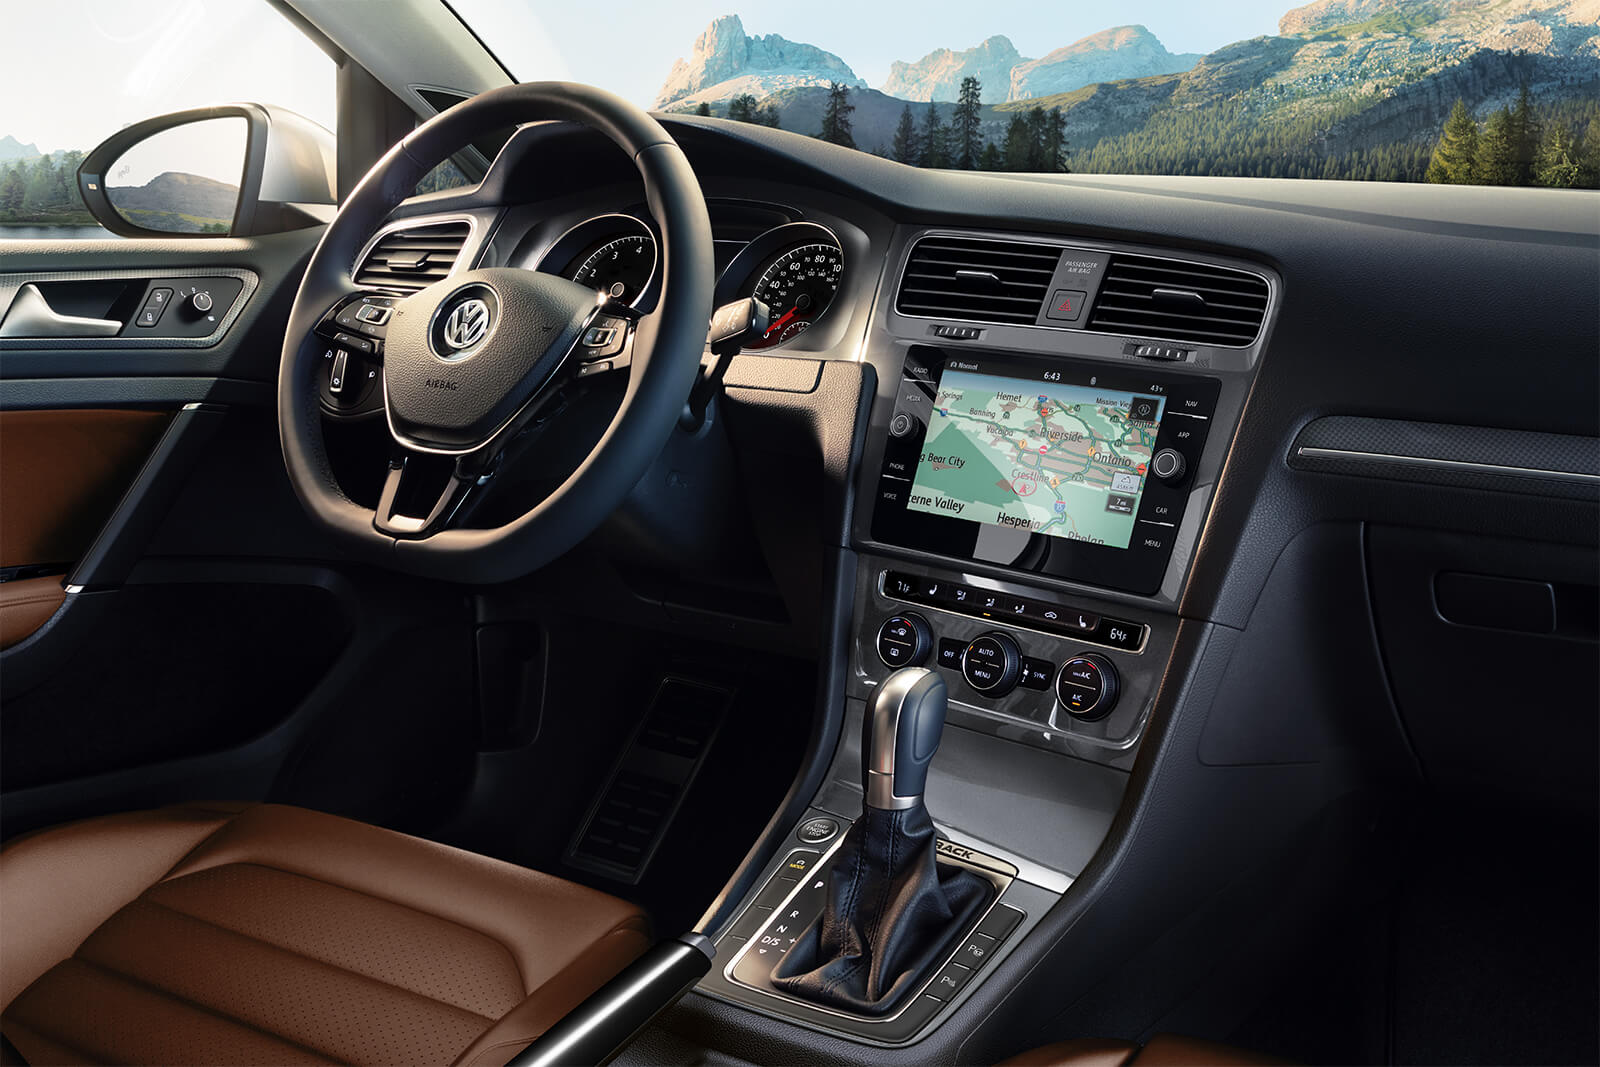 Interior of the 2019 Volkswagen Golf Alltrack